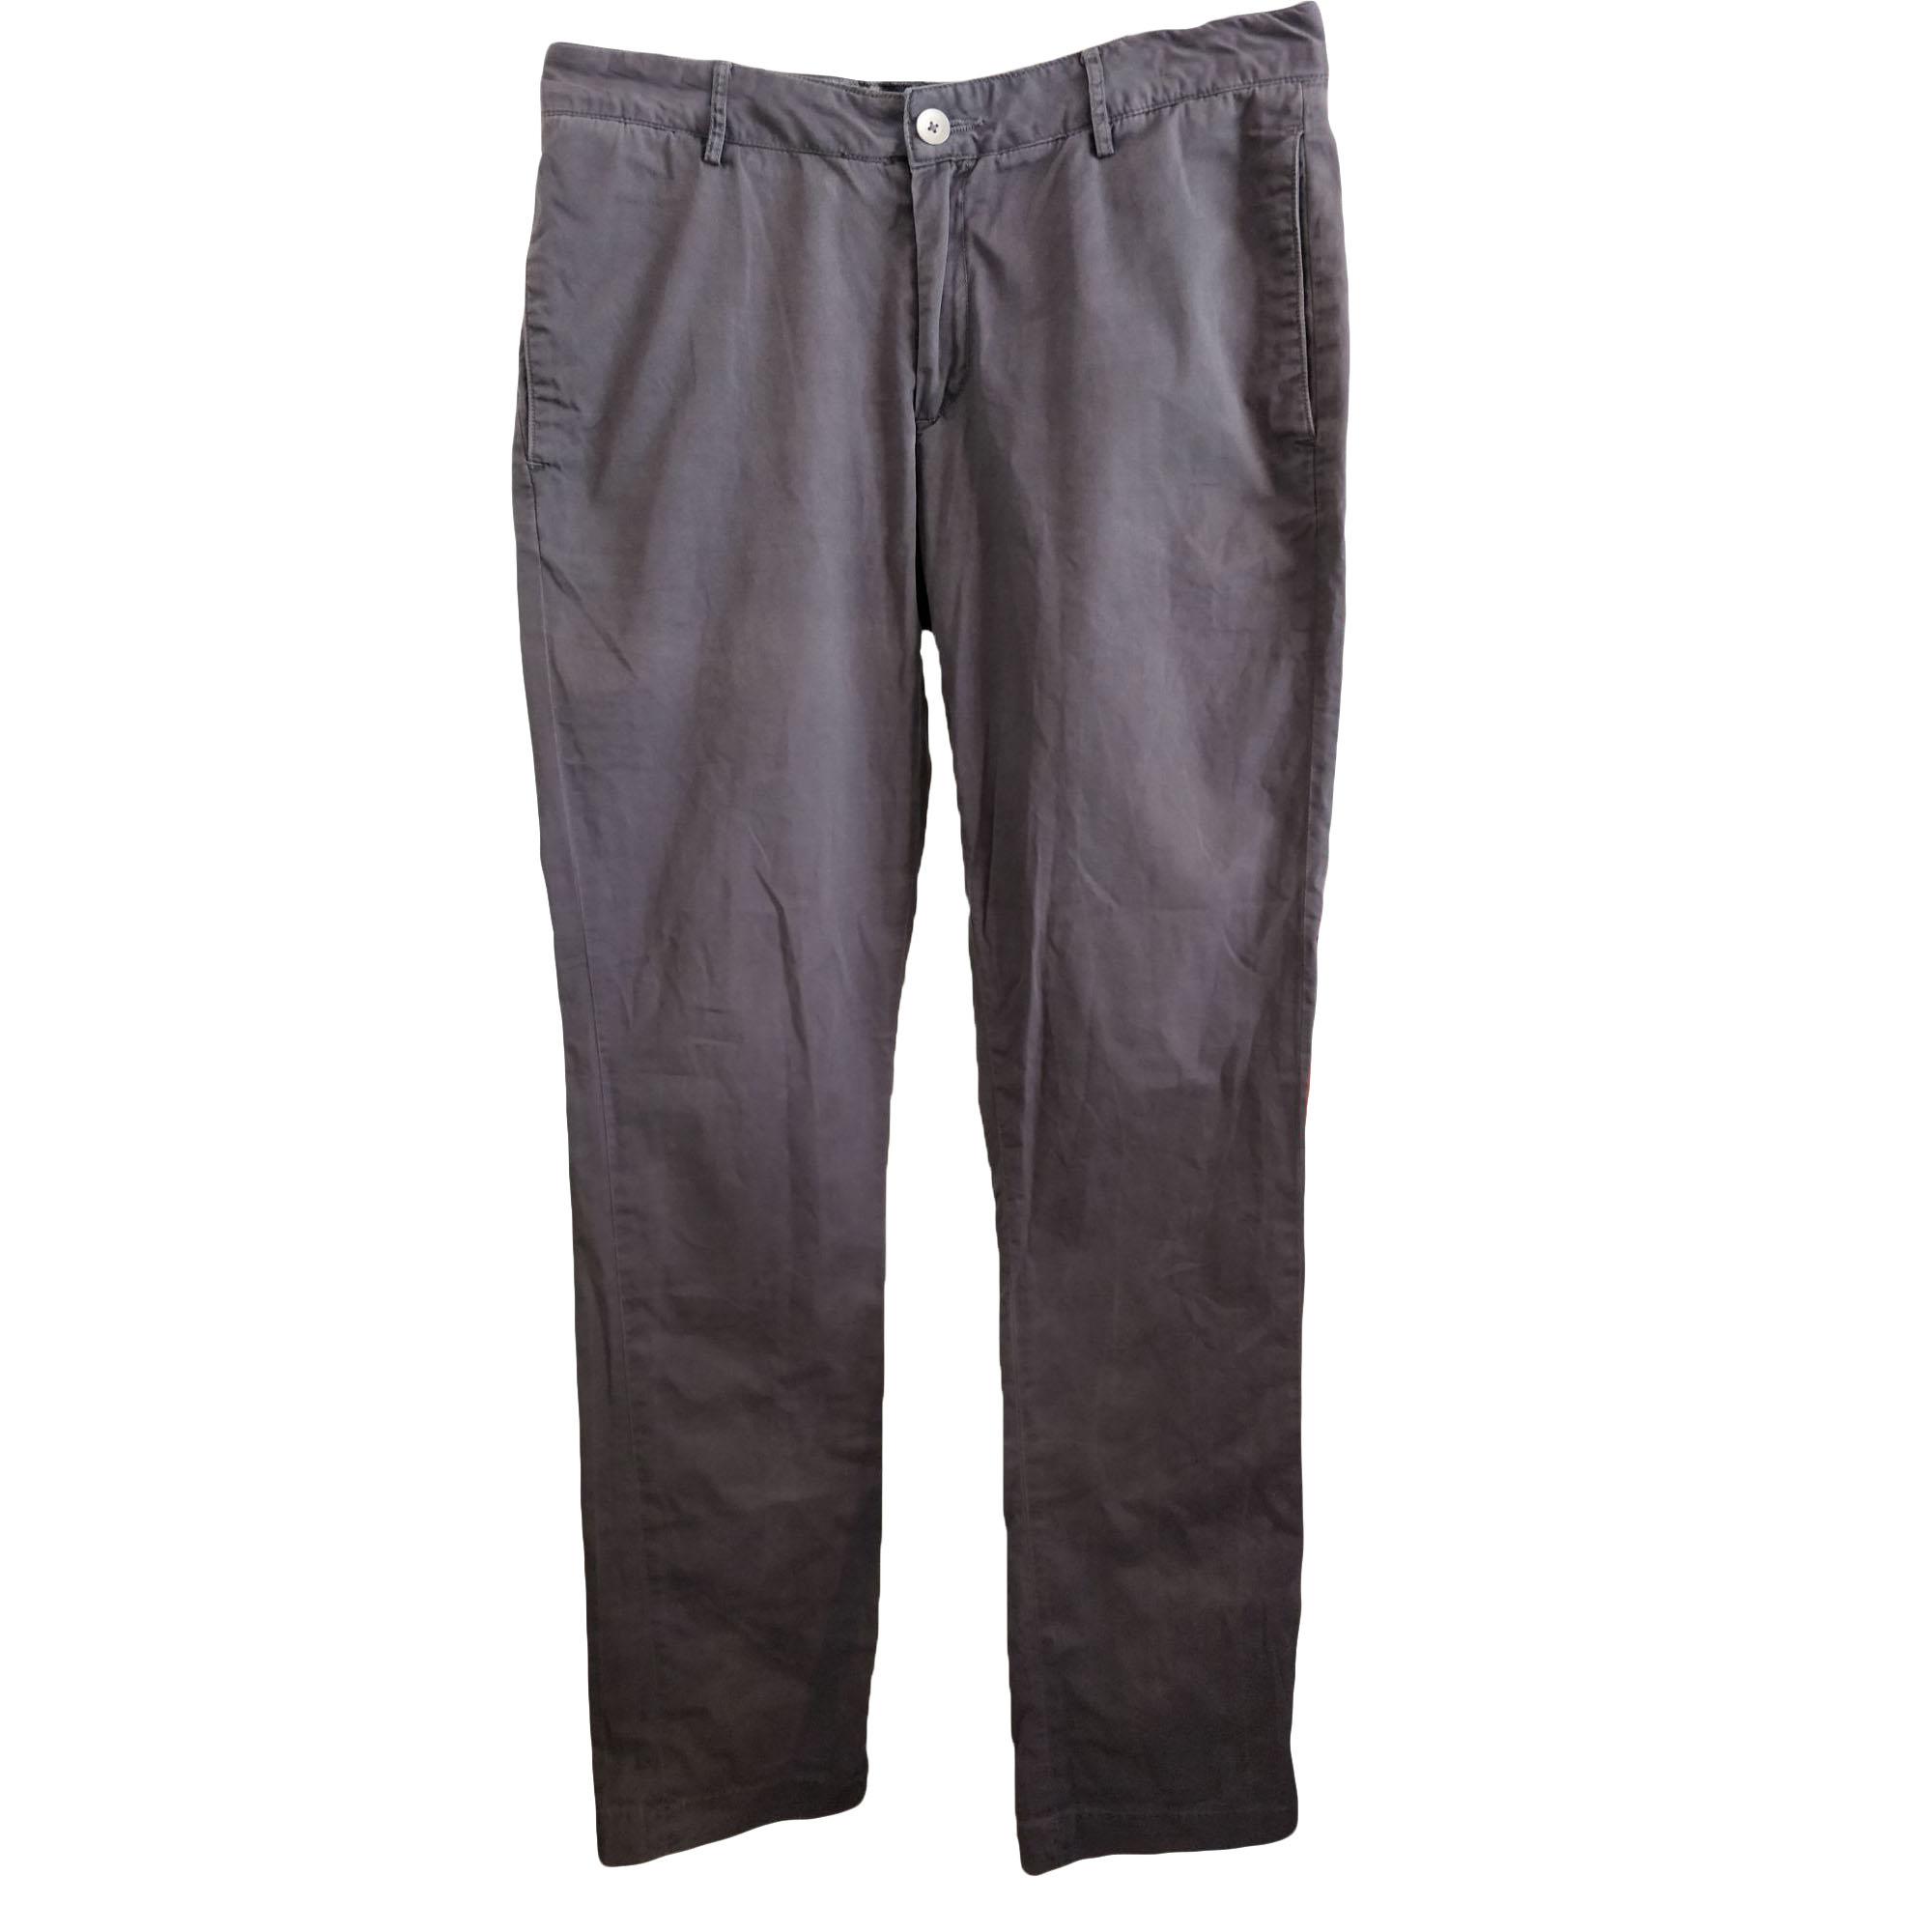 Straight Leg Pants ACNE Gray, charcoal